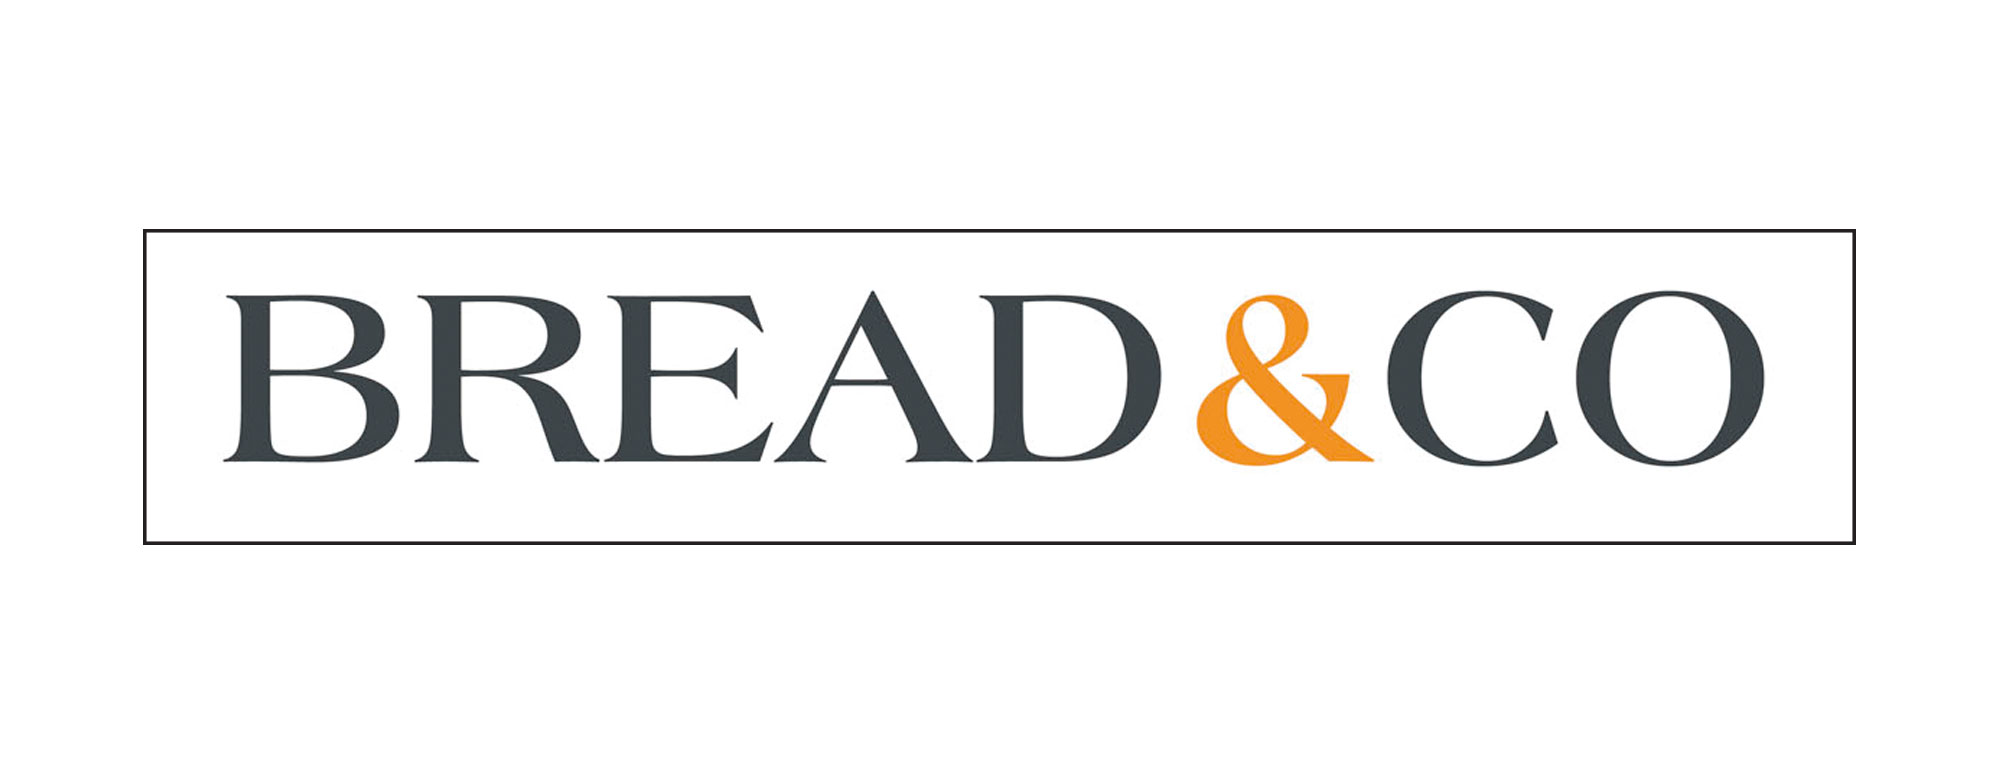 bread&co logo